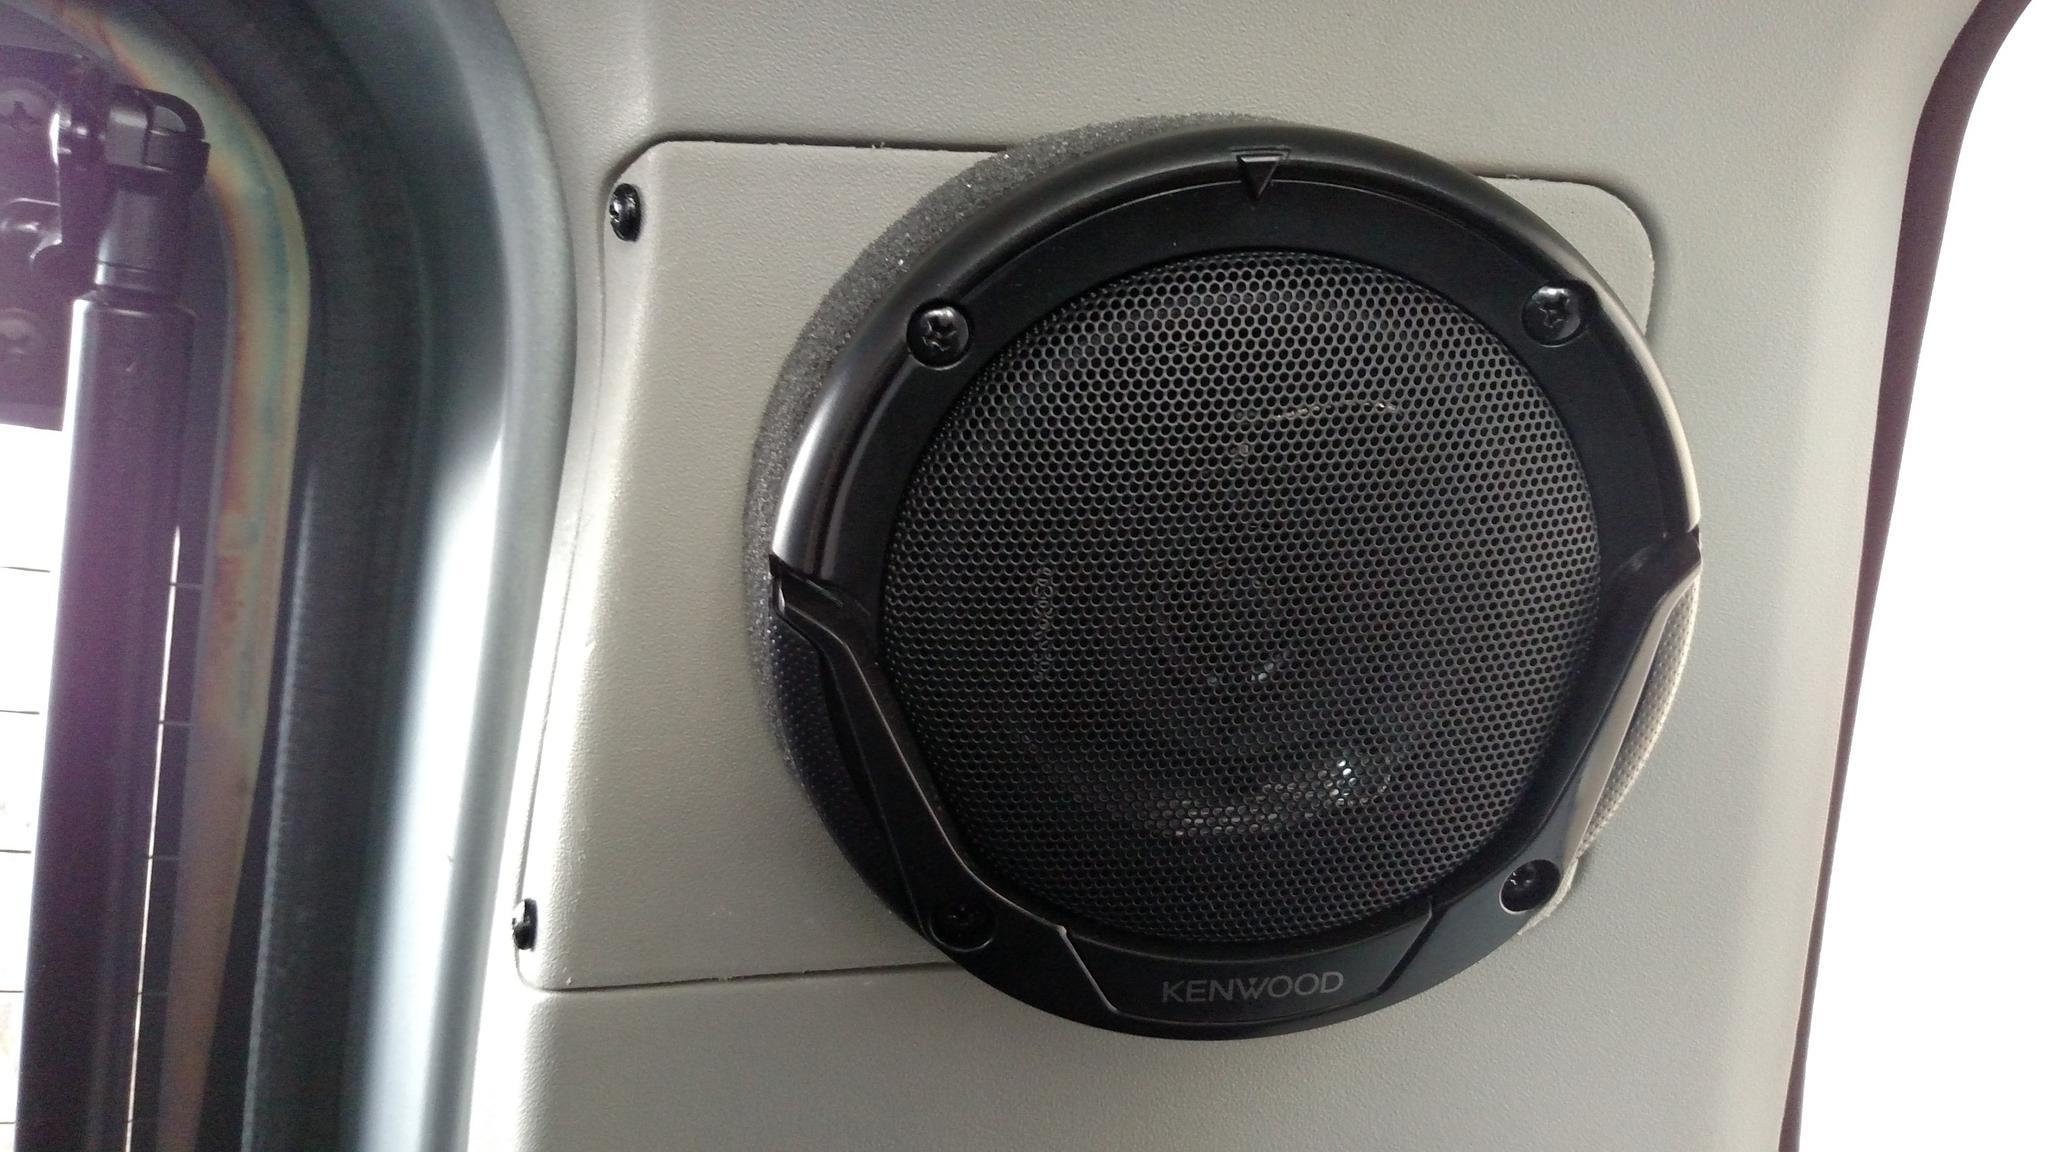 Metra Wiring Harness Toyota Fj Cruiser Diagram Stereo Adapters 4 Kenwood Kfc 1065r Speakers In Rear Pillars Forum Ford